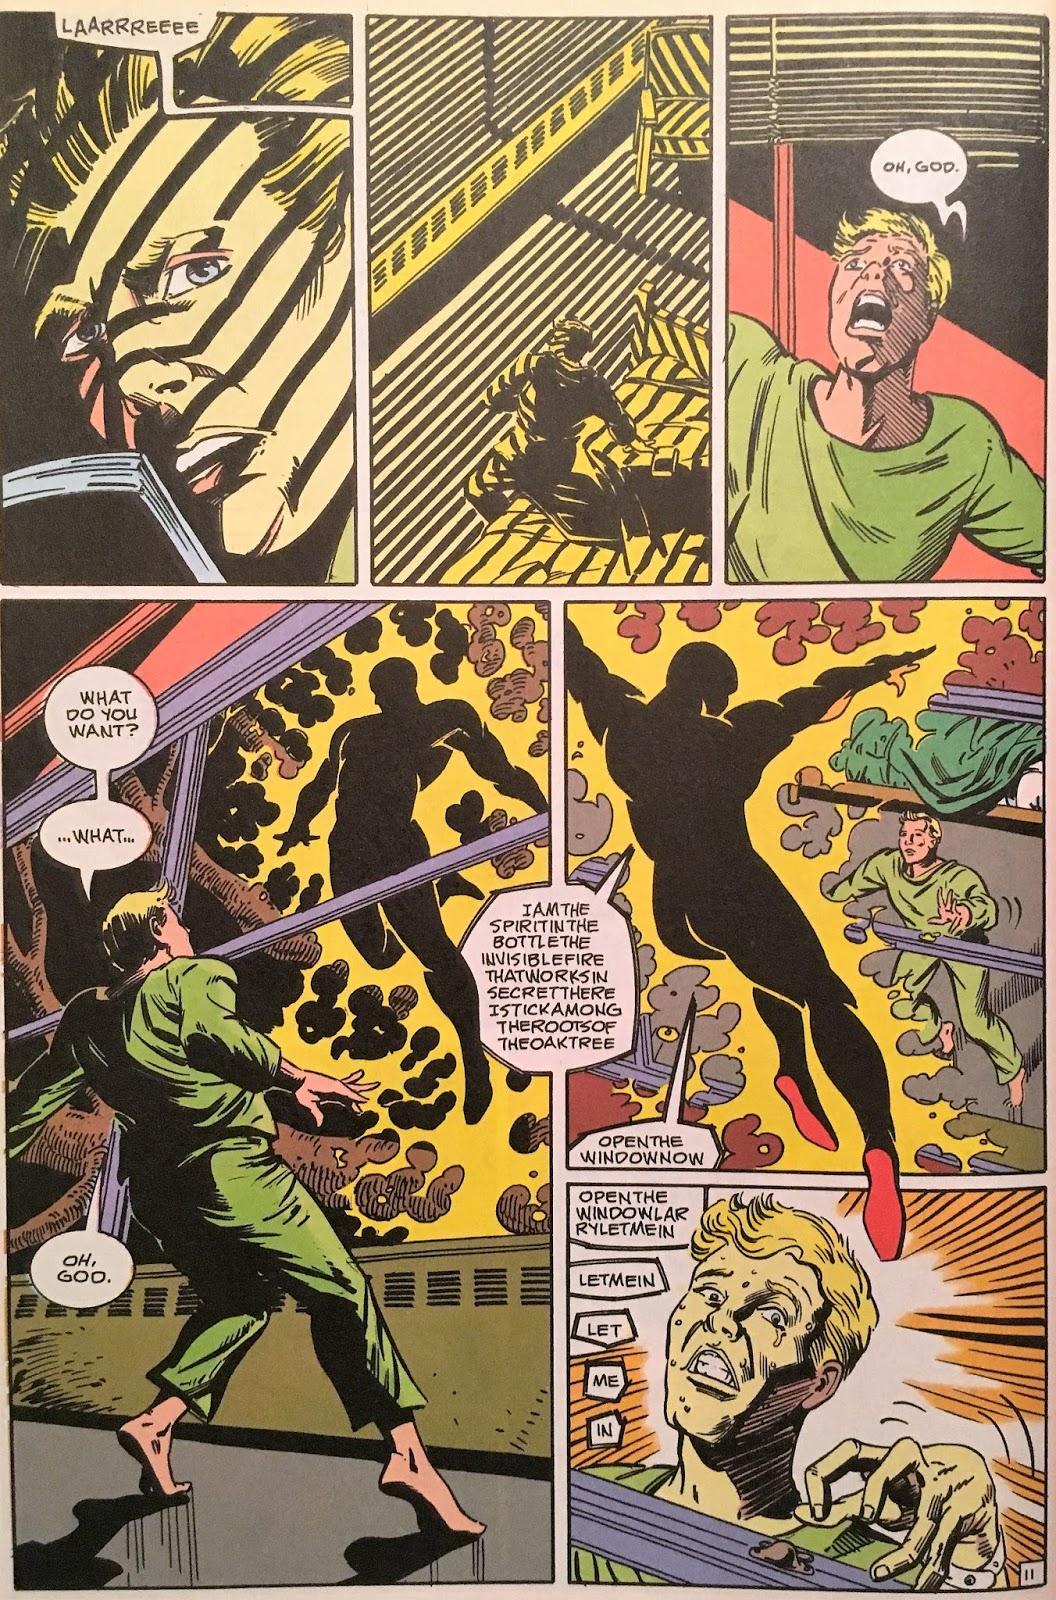 The Doom Patrol #19 February 1989 DC Comics Morrison Case